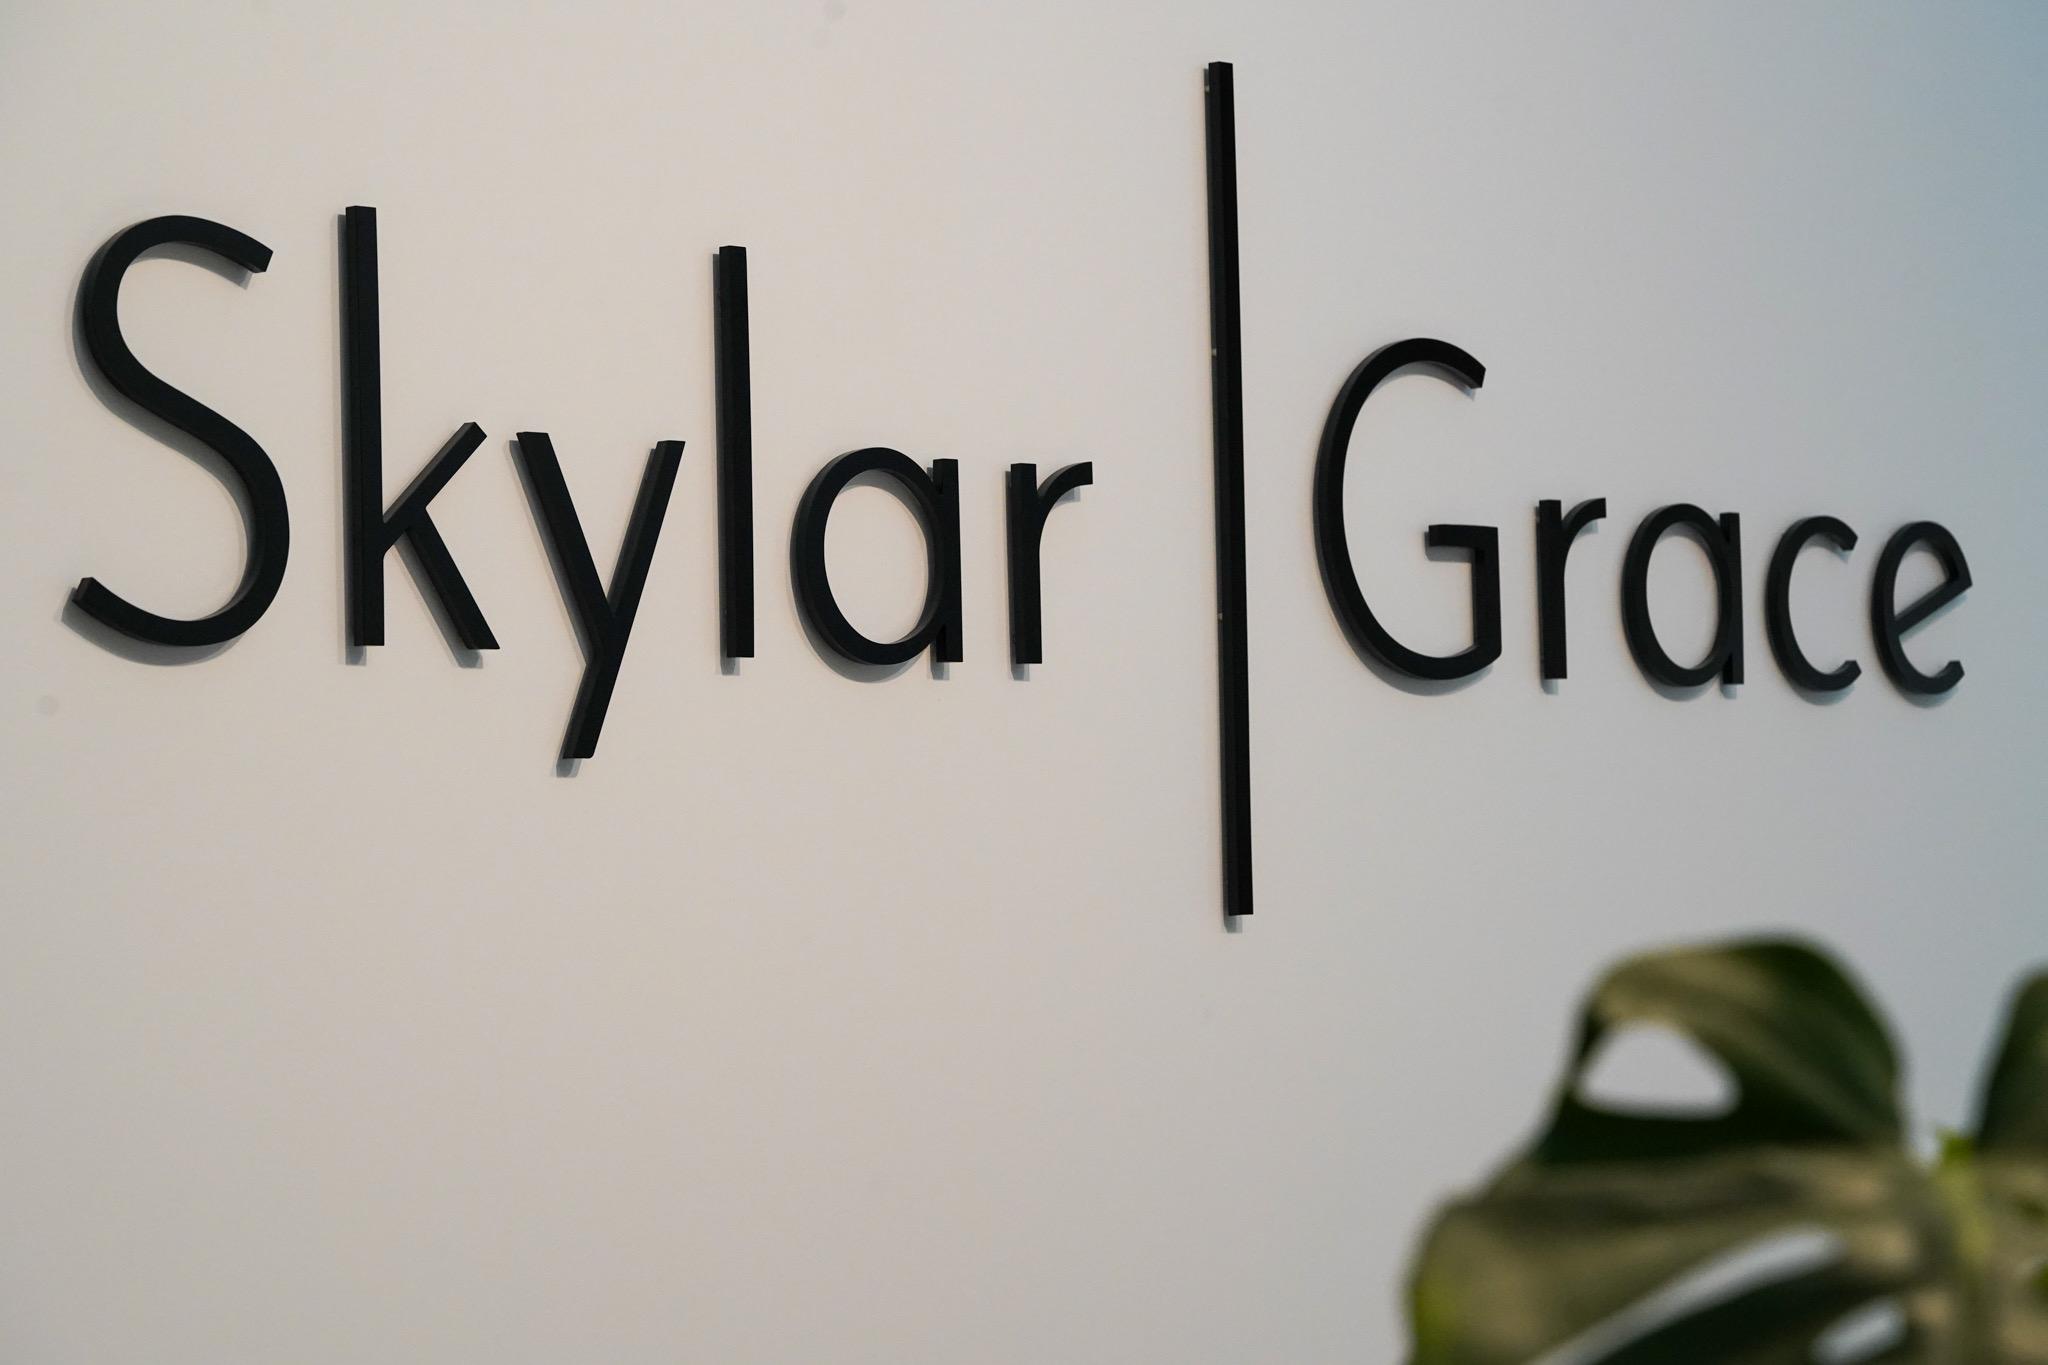 Skylar Grace Spa reviews   Spas at 26400 Kuykendahl Rd - Spring TX